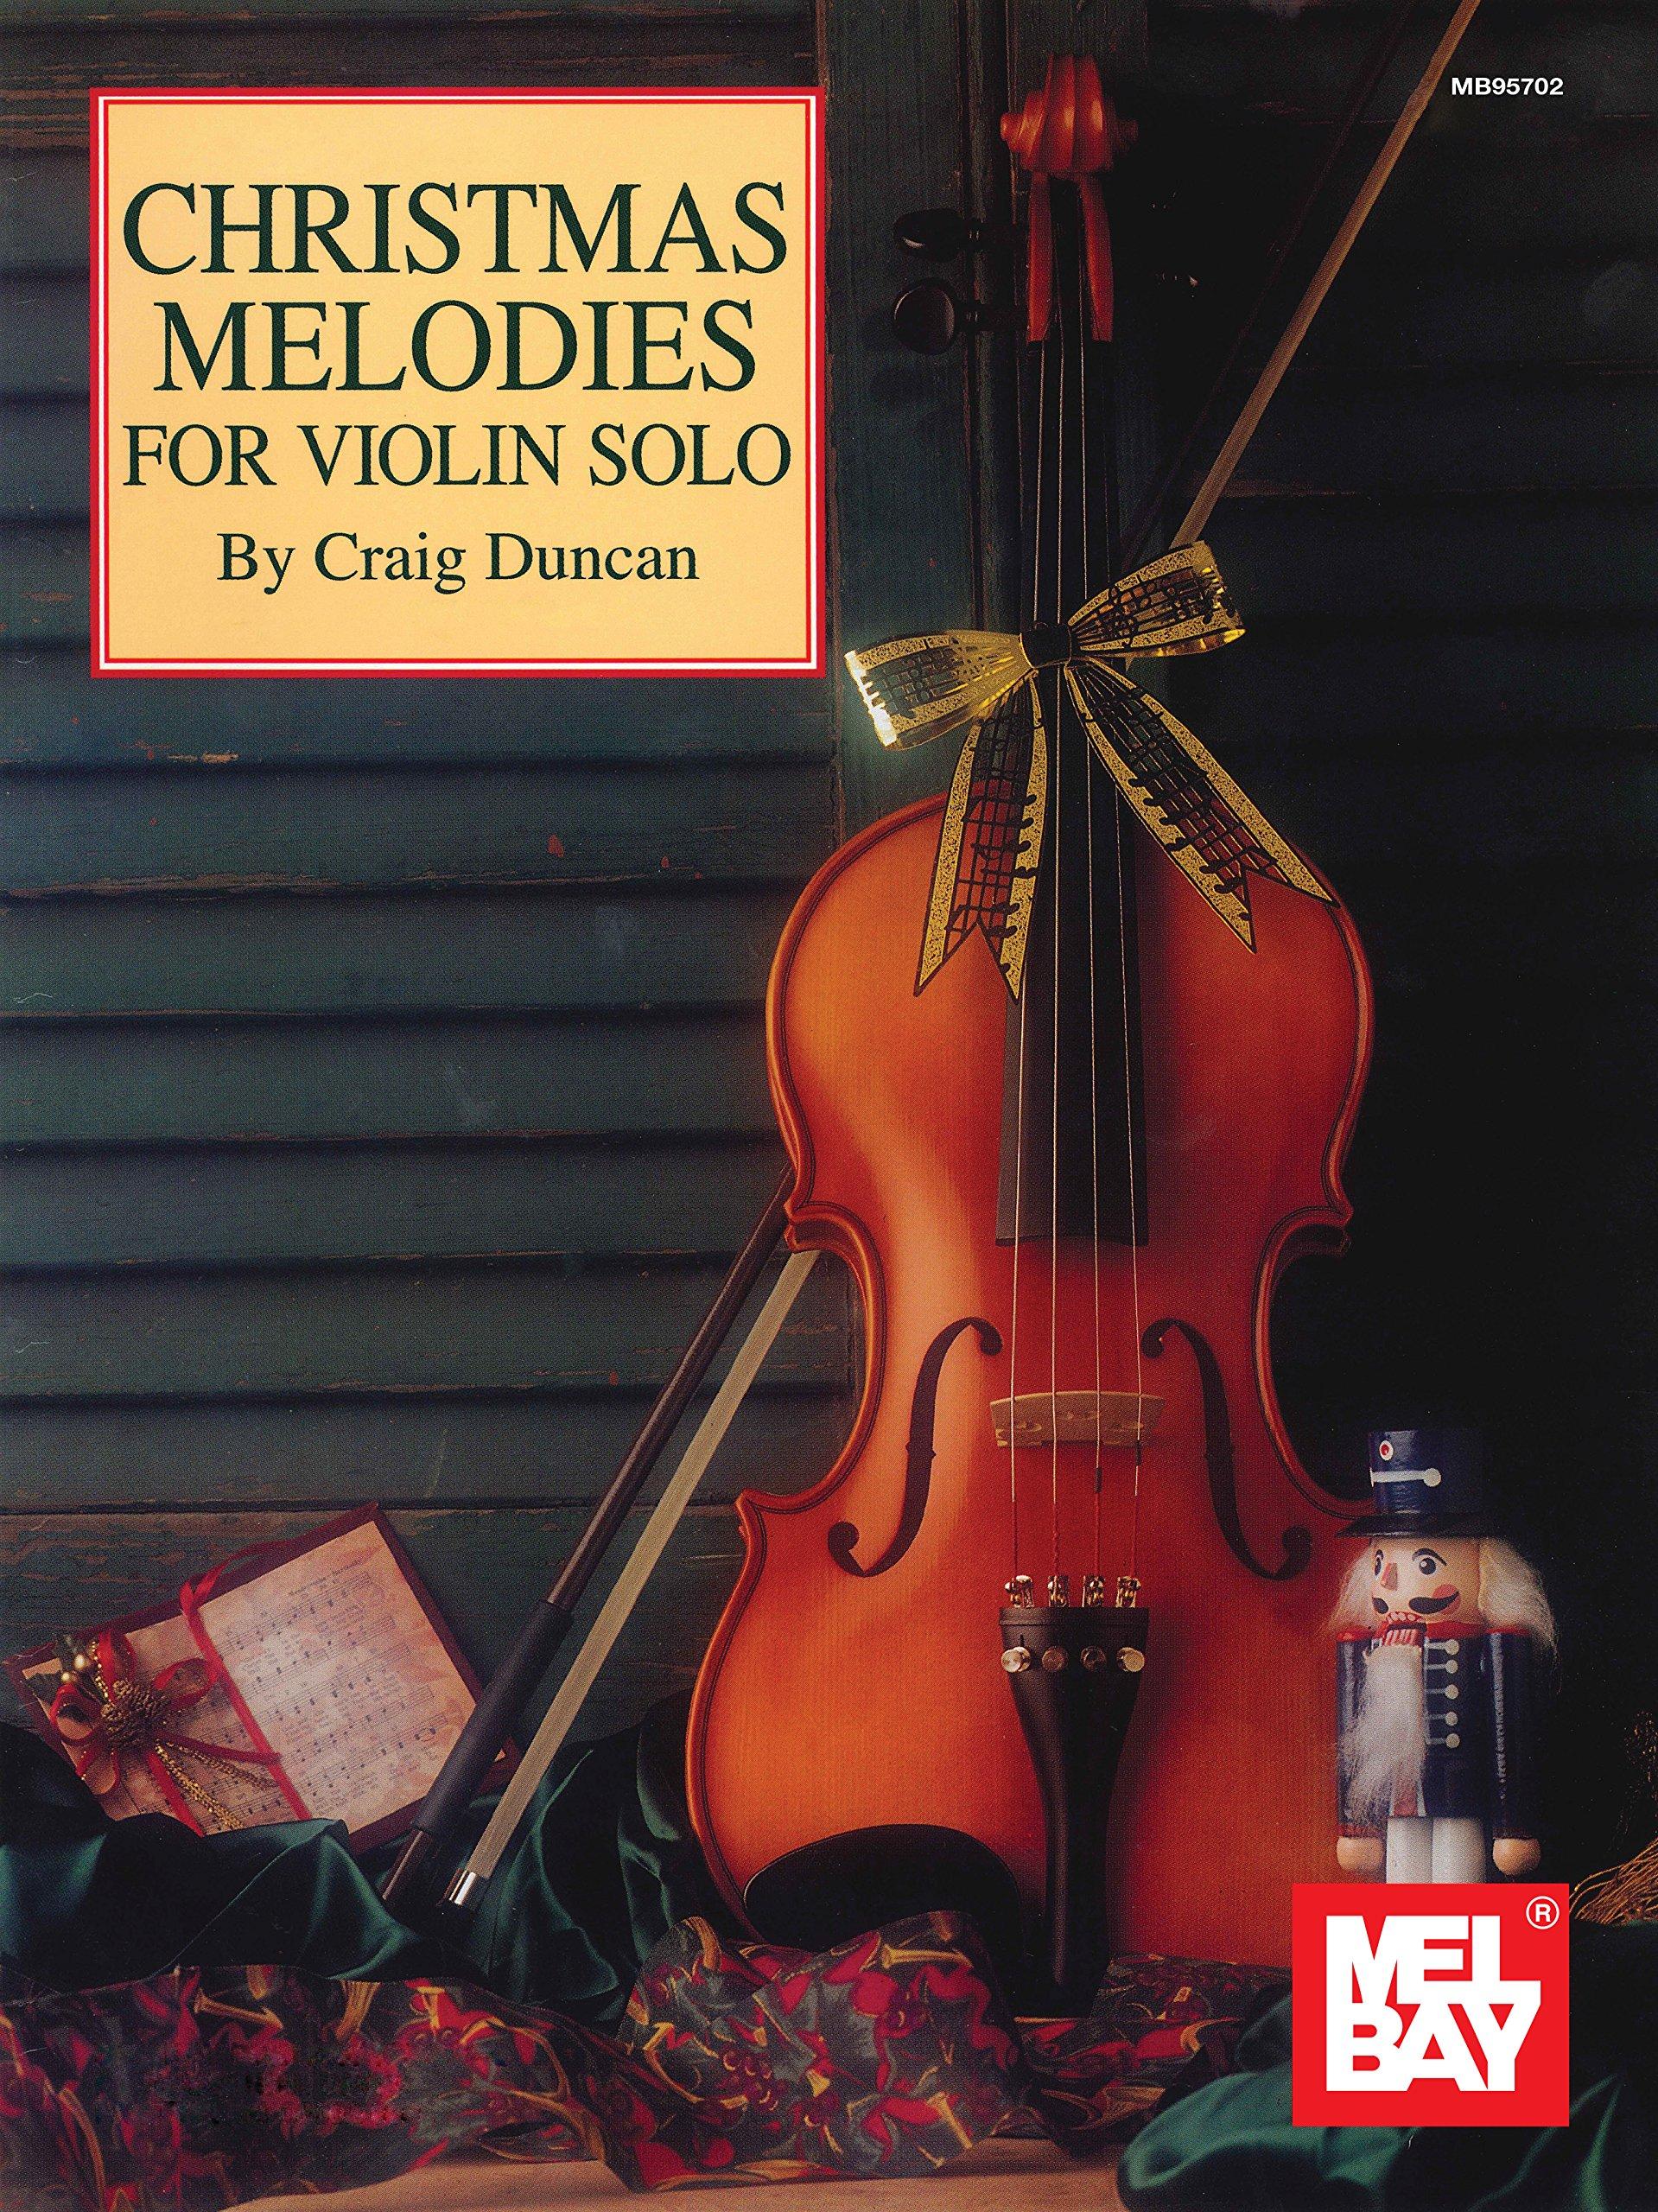 Christmas Violin.Amazon Com Christmas Melodies For Violin Solo